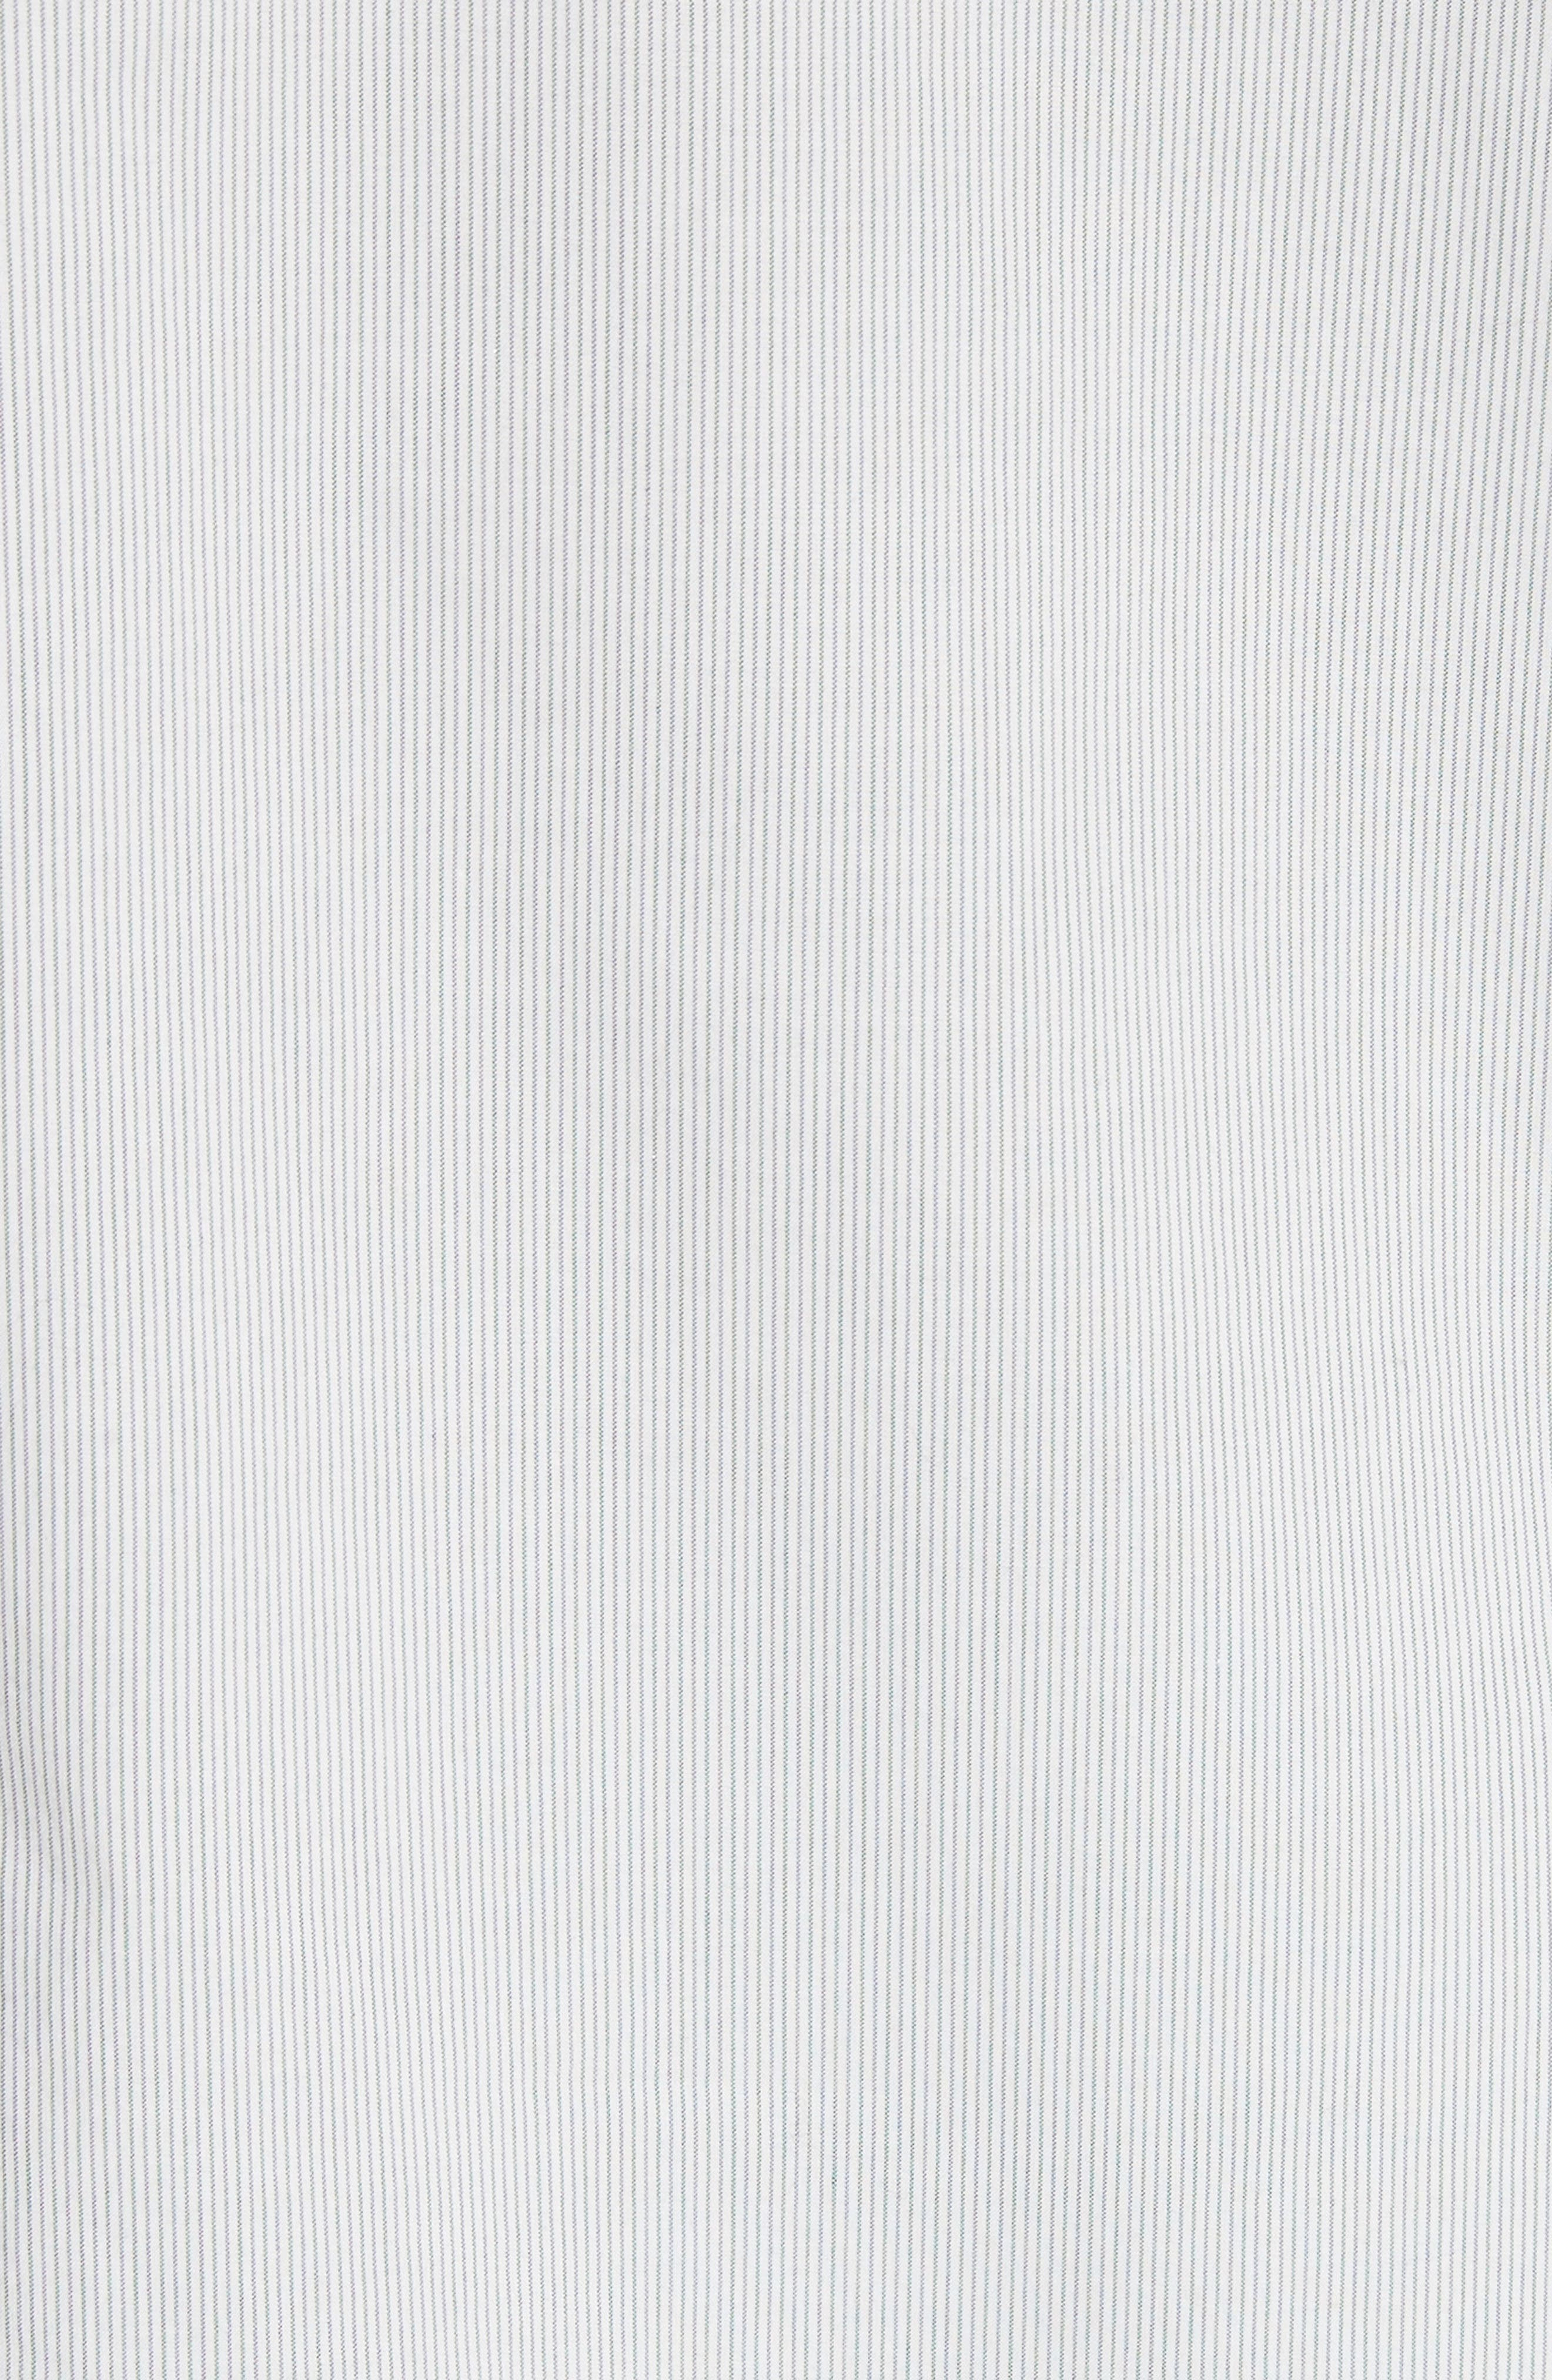 Ruffle Stripe Cotton Top,                             Alternate thumbnail 5, color,                             Milk Combo